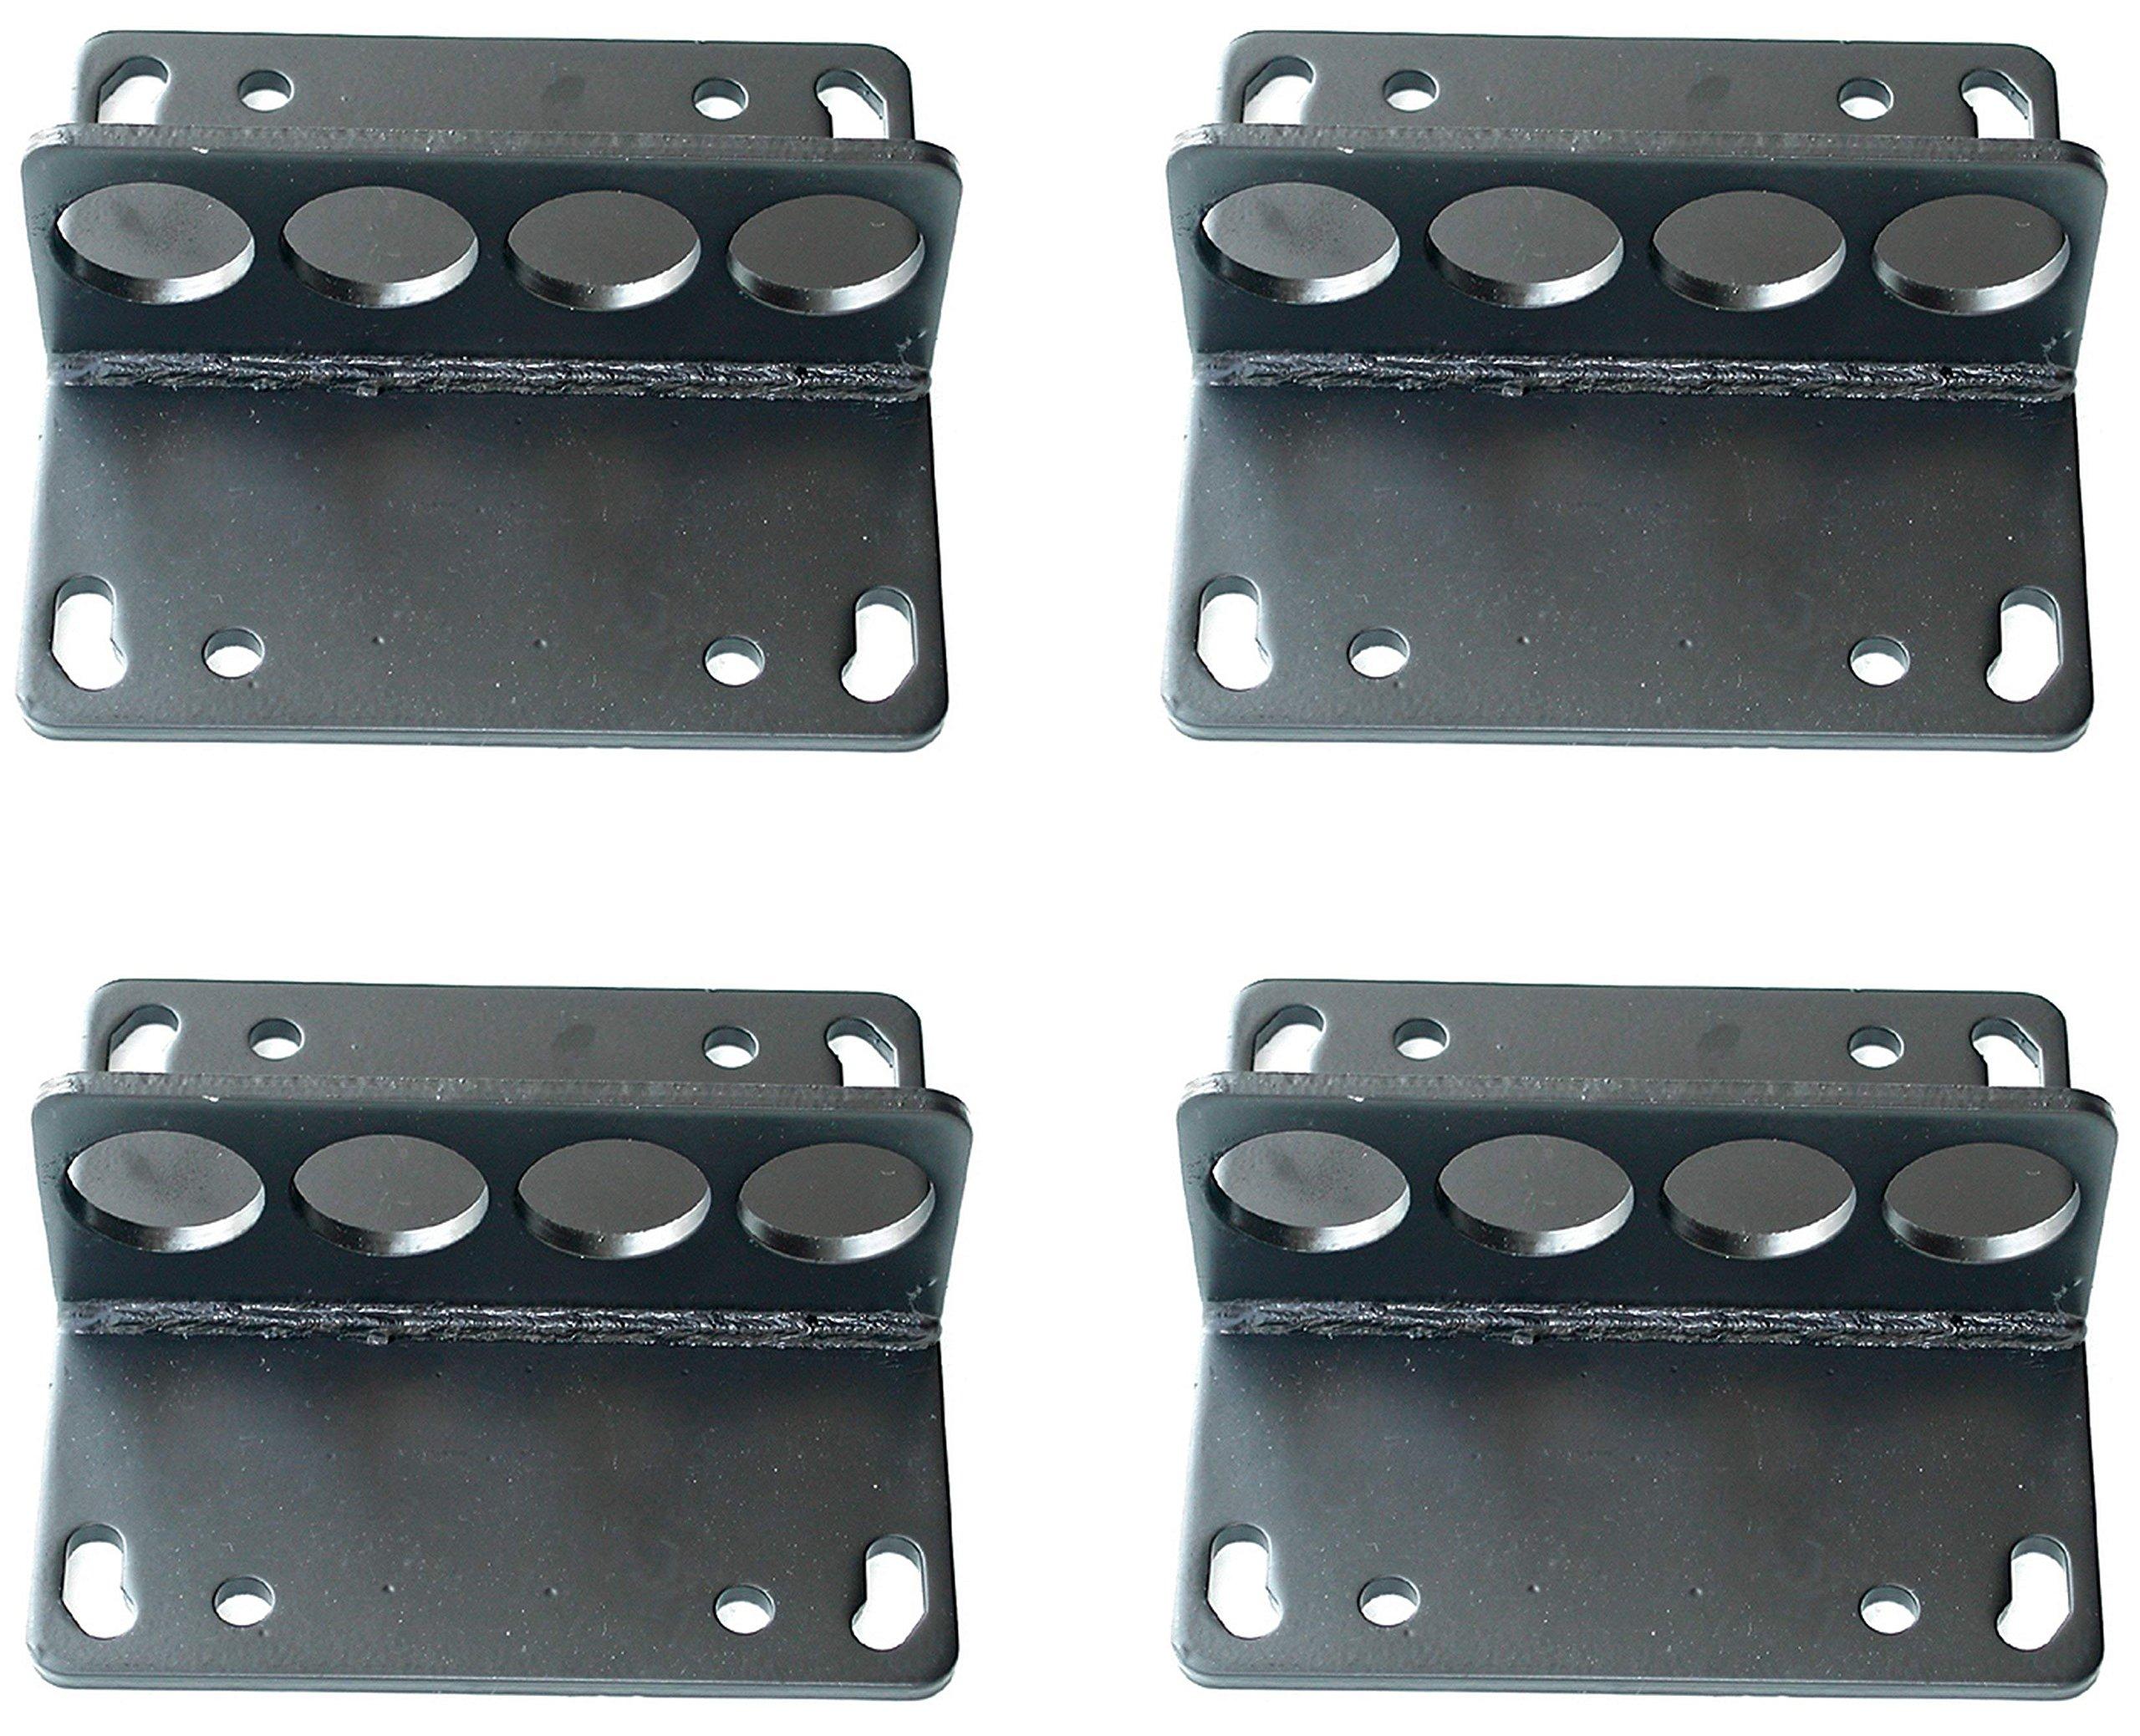 Proform ® 67457 Engine Lift Plate (4)